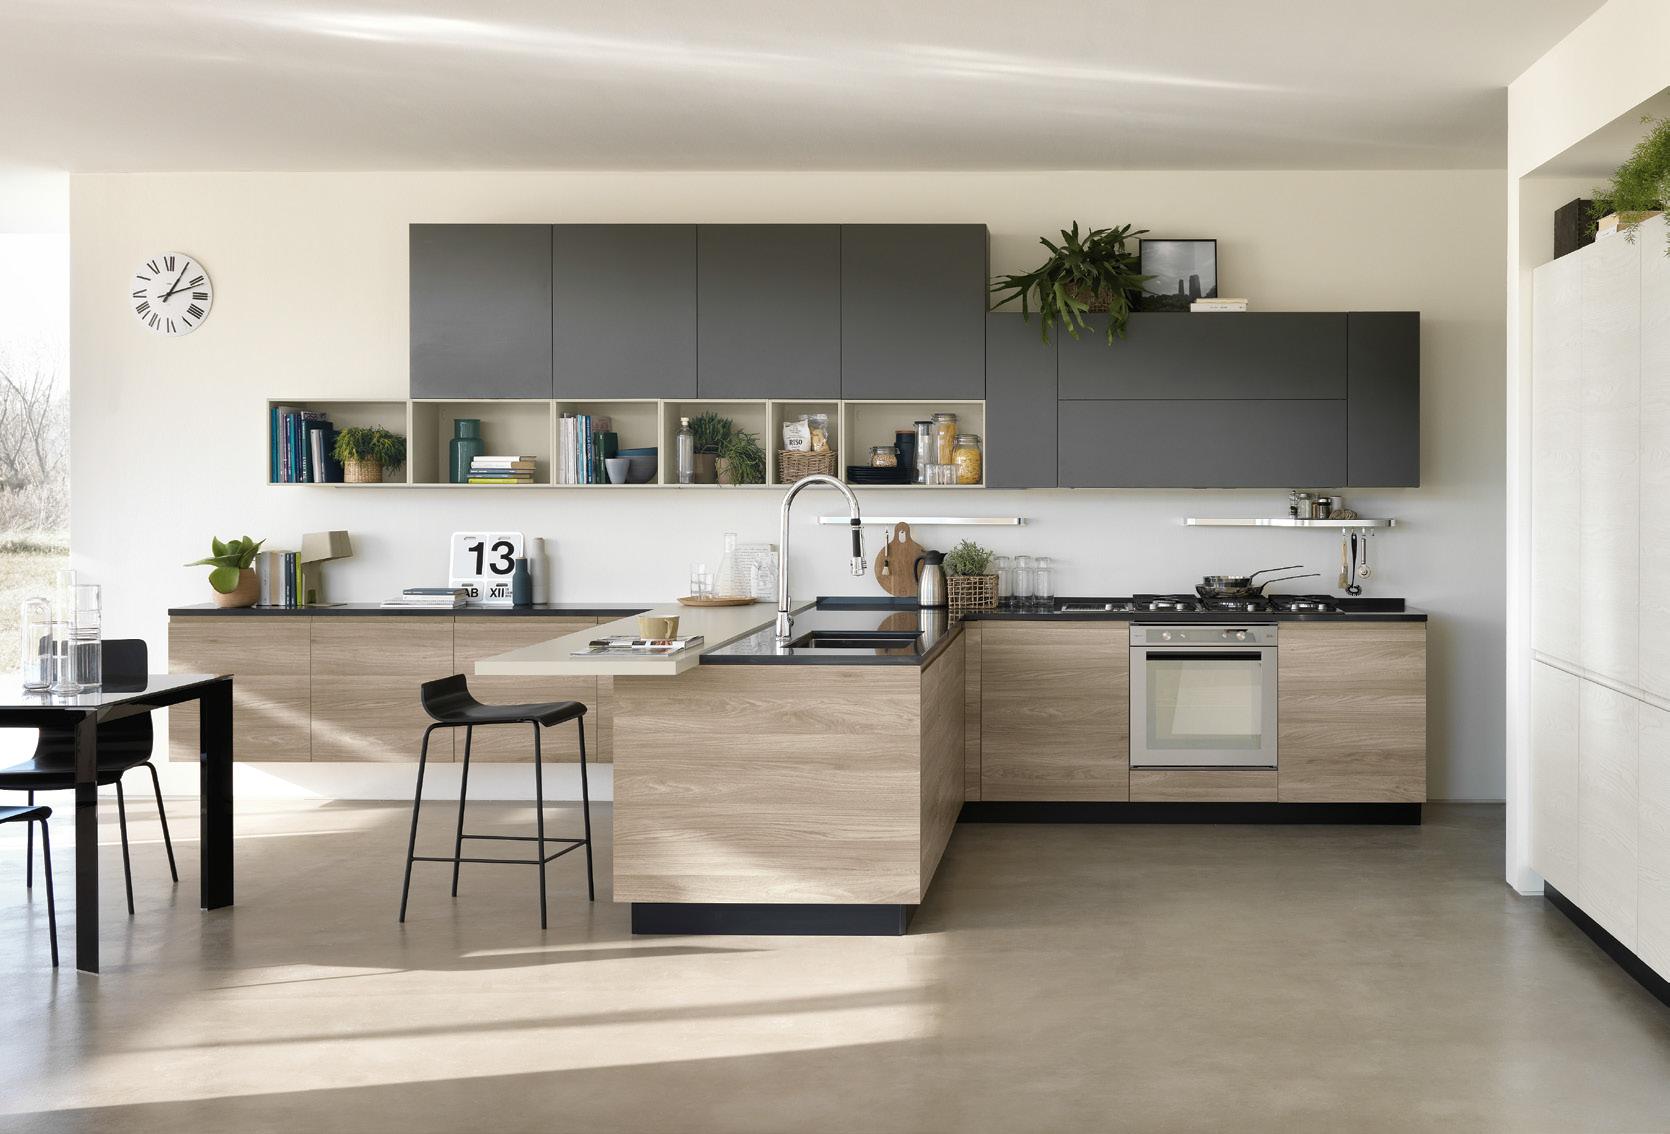 Mondo convenienza cucina stella rovere grigio - Mondo convenienza accessori cucina ...